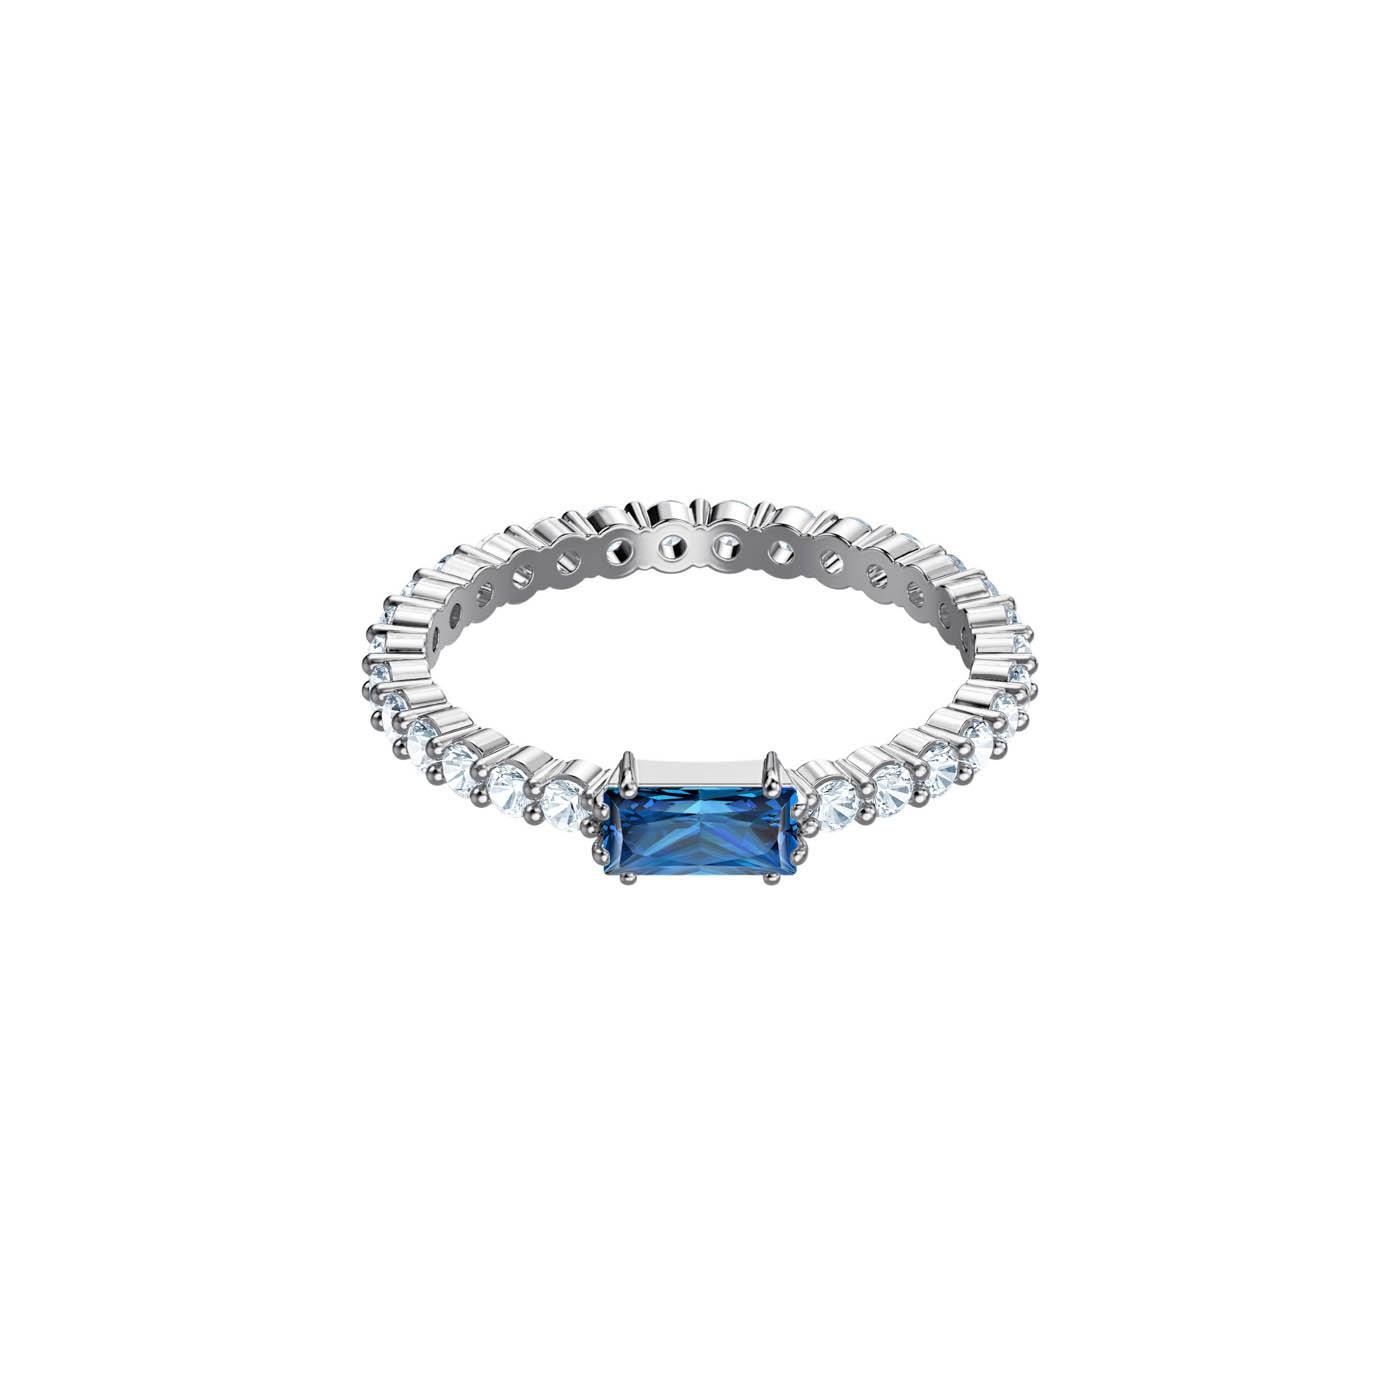 e1307bacb Swarovski Vittore Ring swarovski-vittore-rect-ring - Jewelry